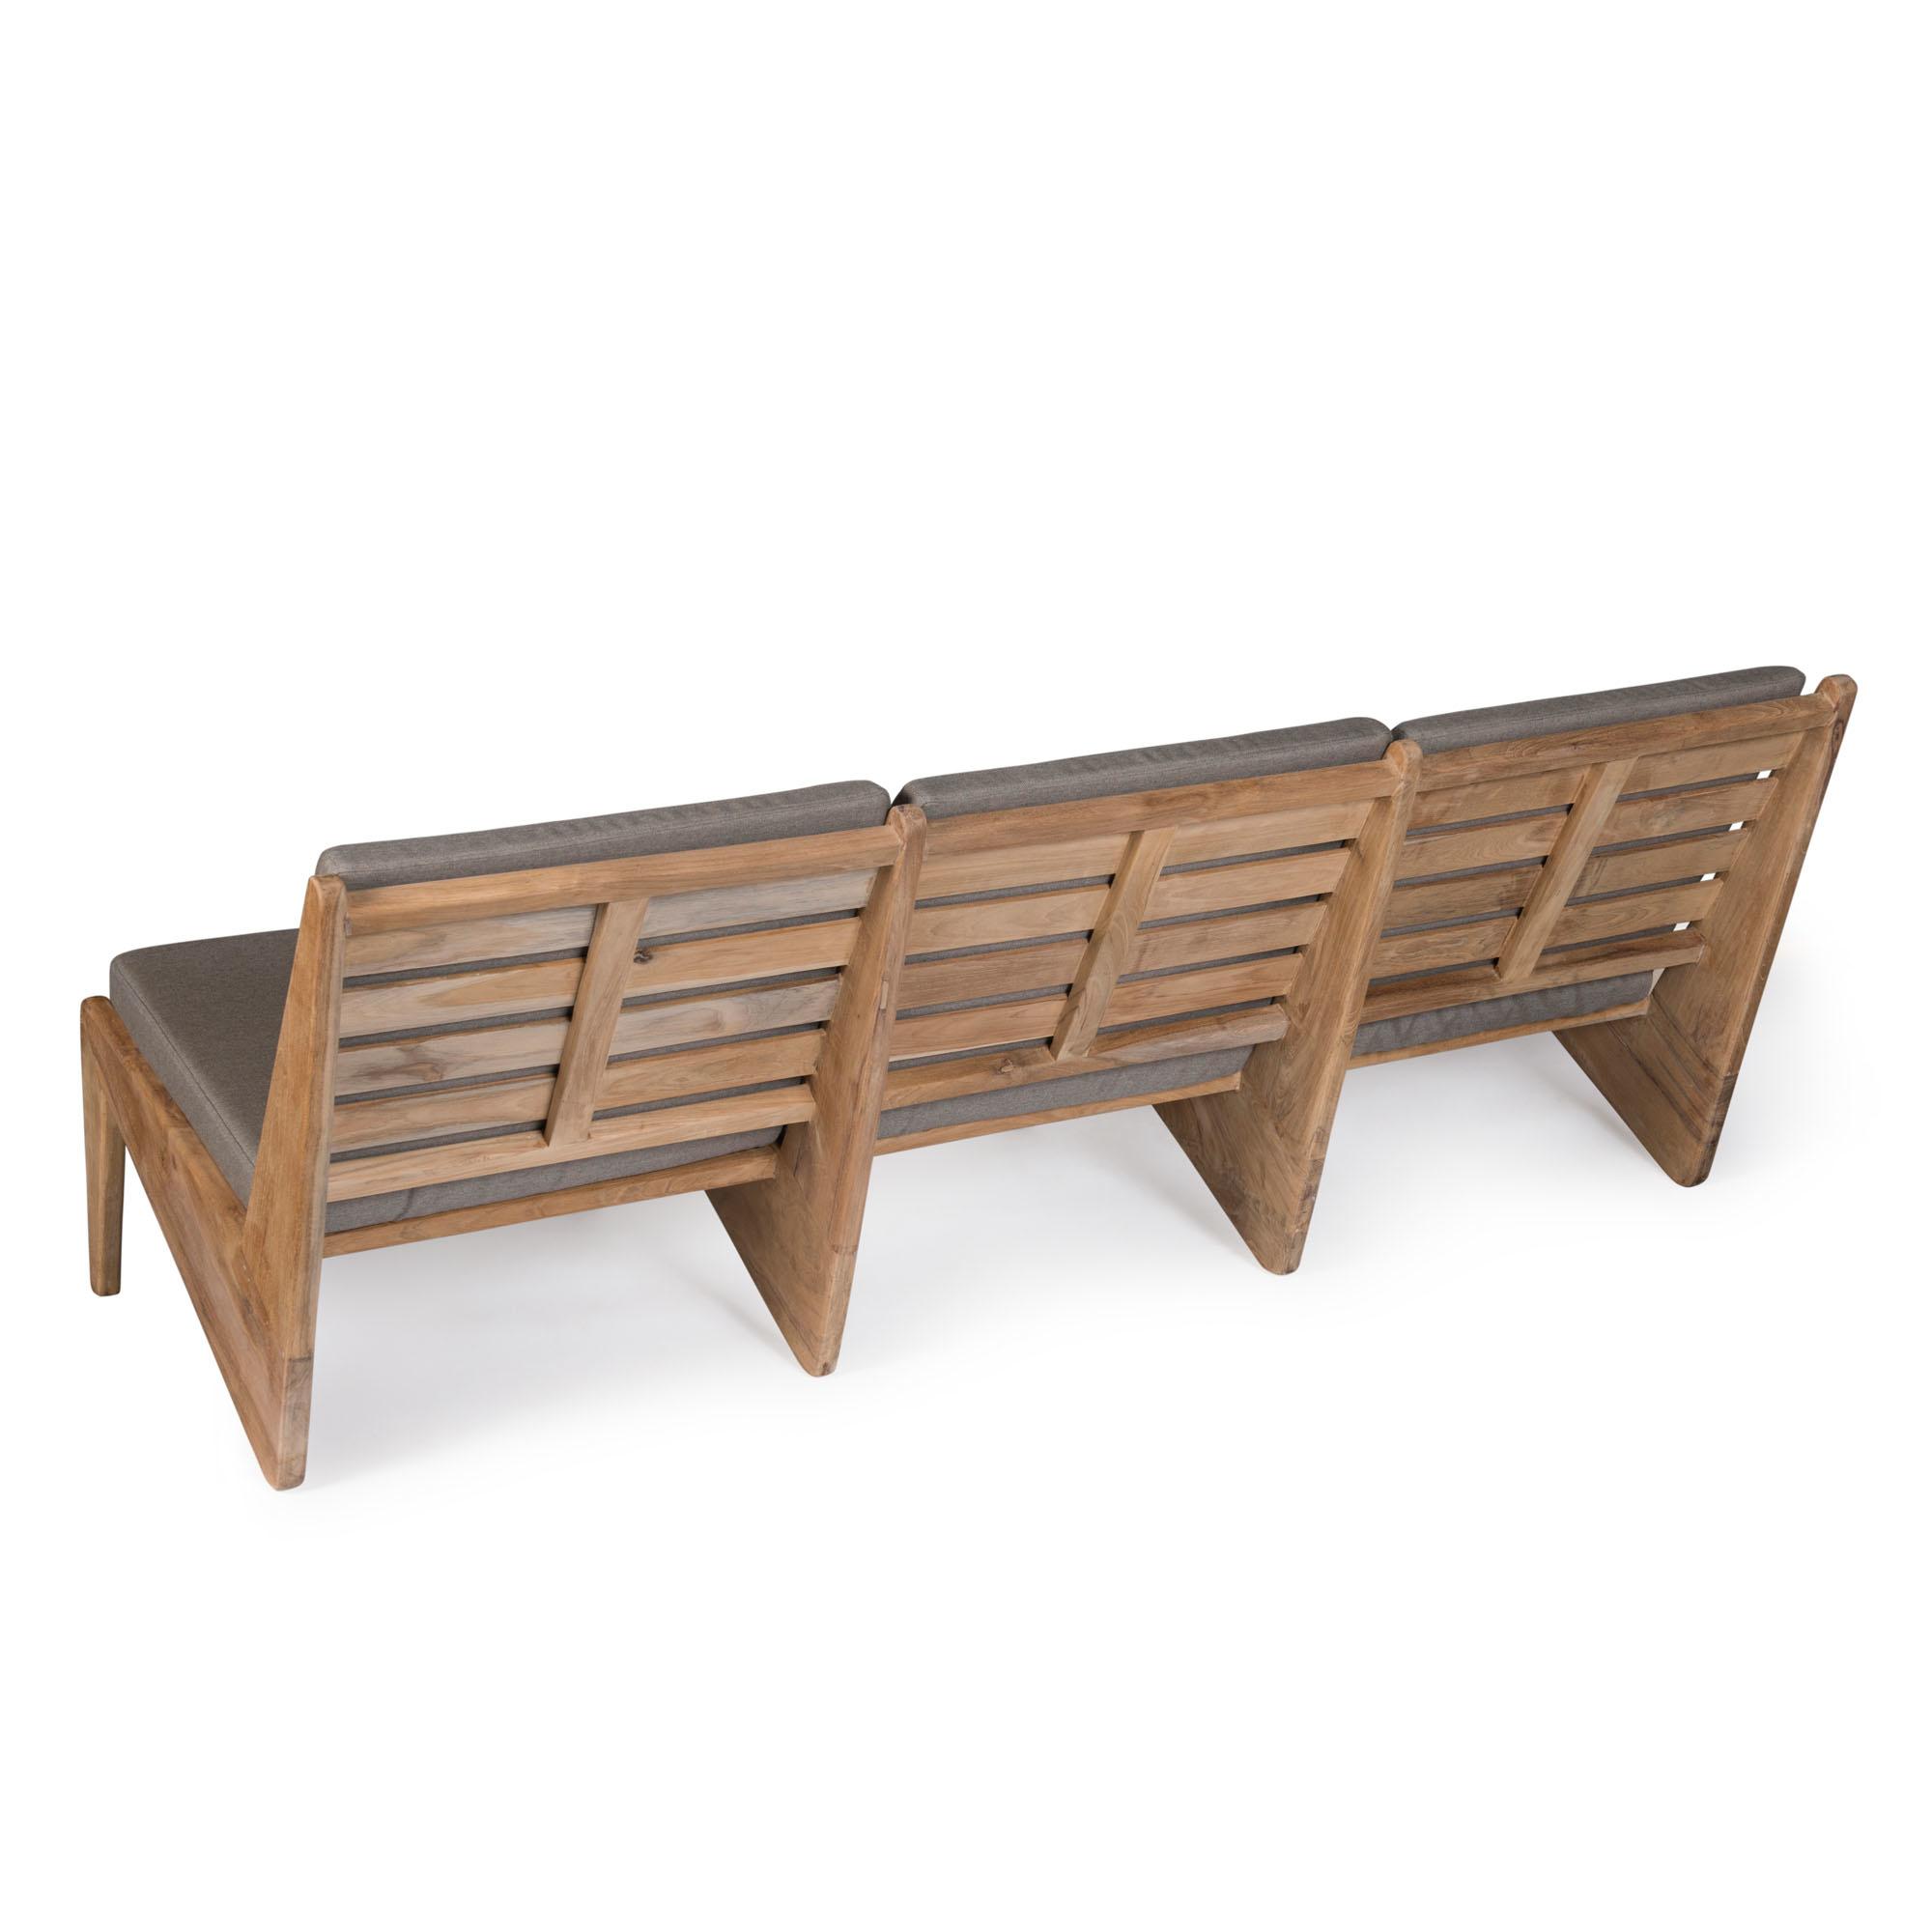 Kangaroo Chair  Bench 3 - Teak Outdoor with Cushion-5